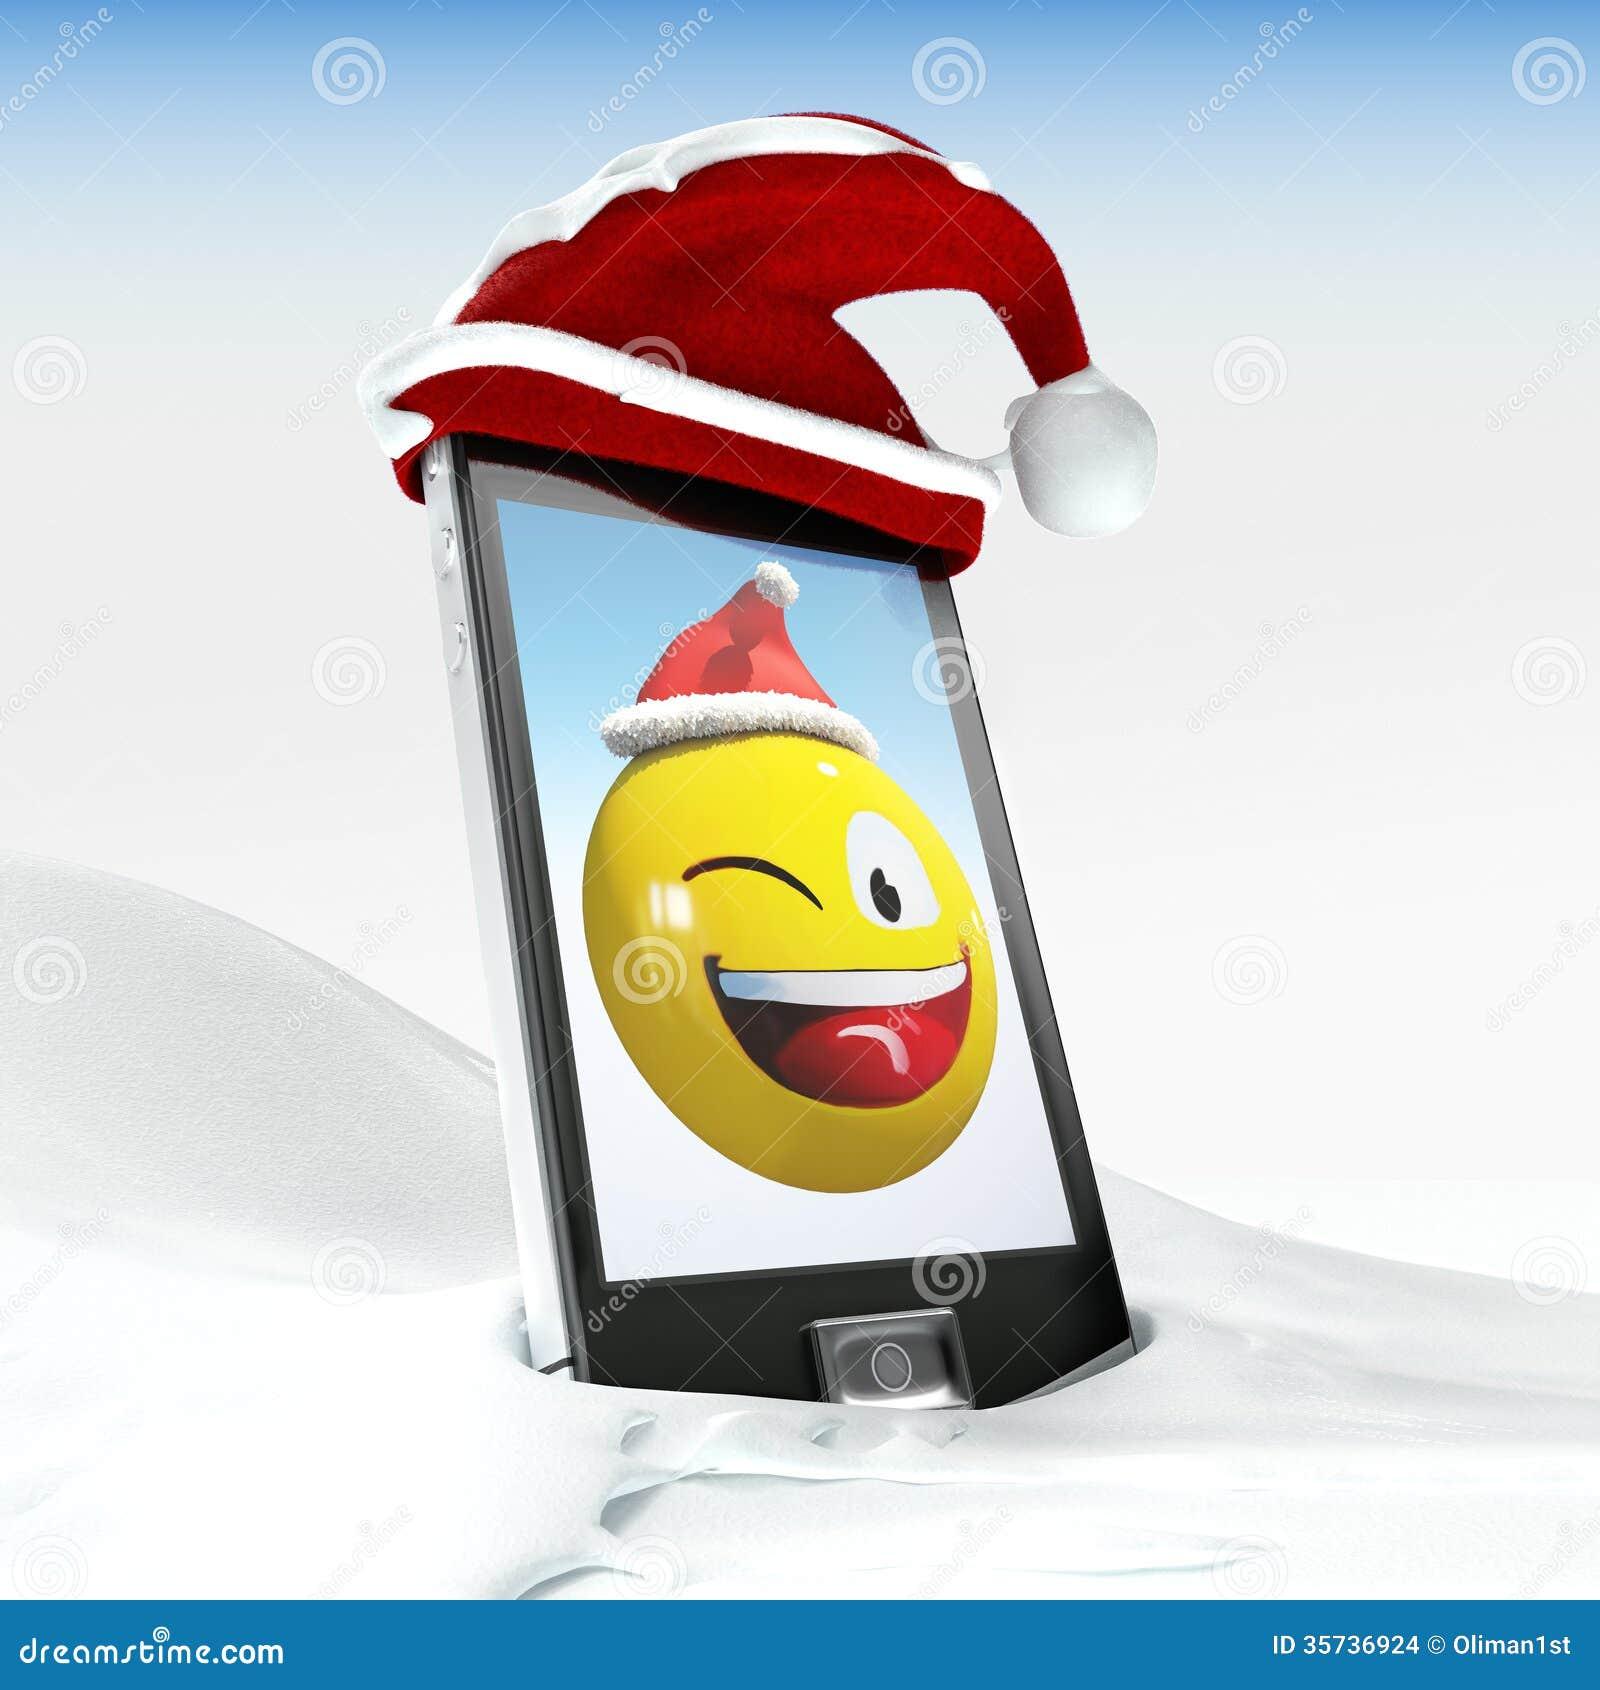 christmas smiley on generic mobile phone 3d illustrated. Black Bedroom Furniture Sets. Home Design Ideas